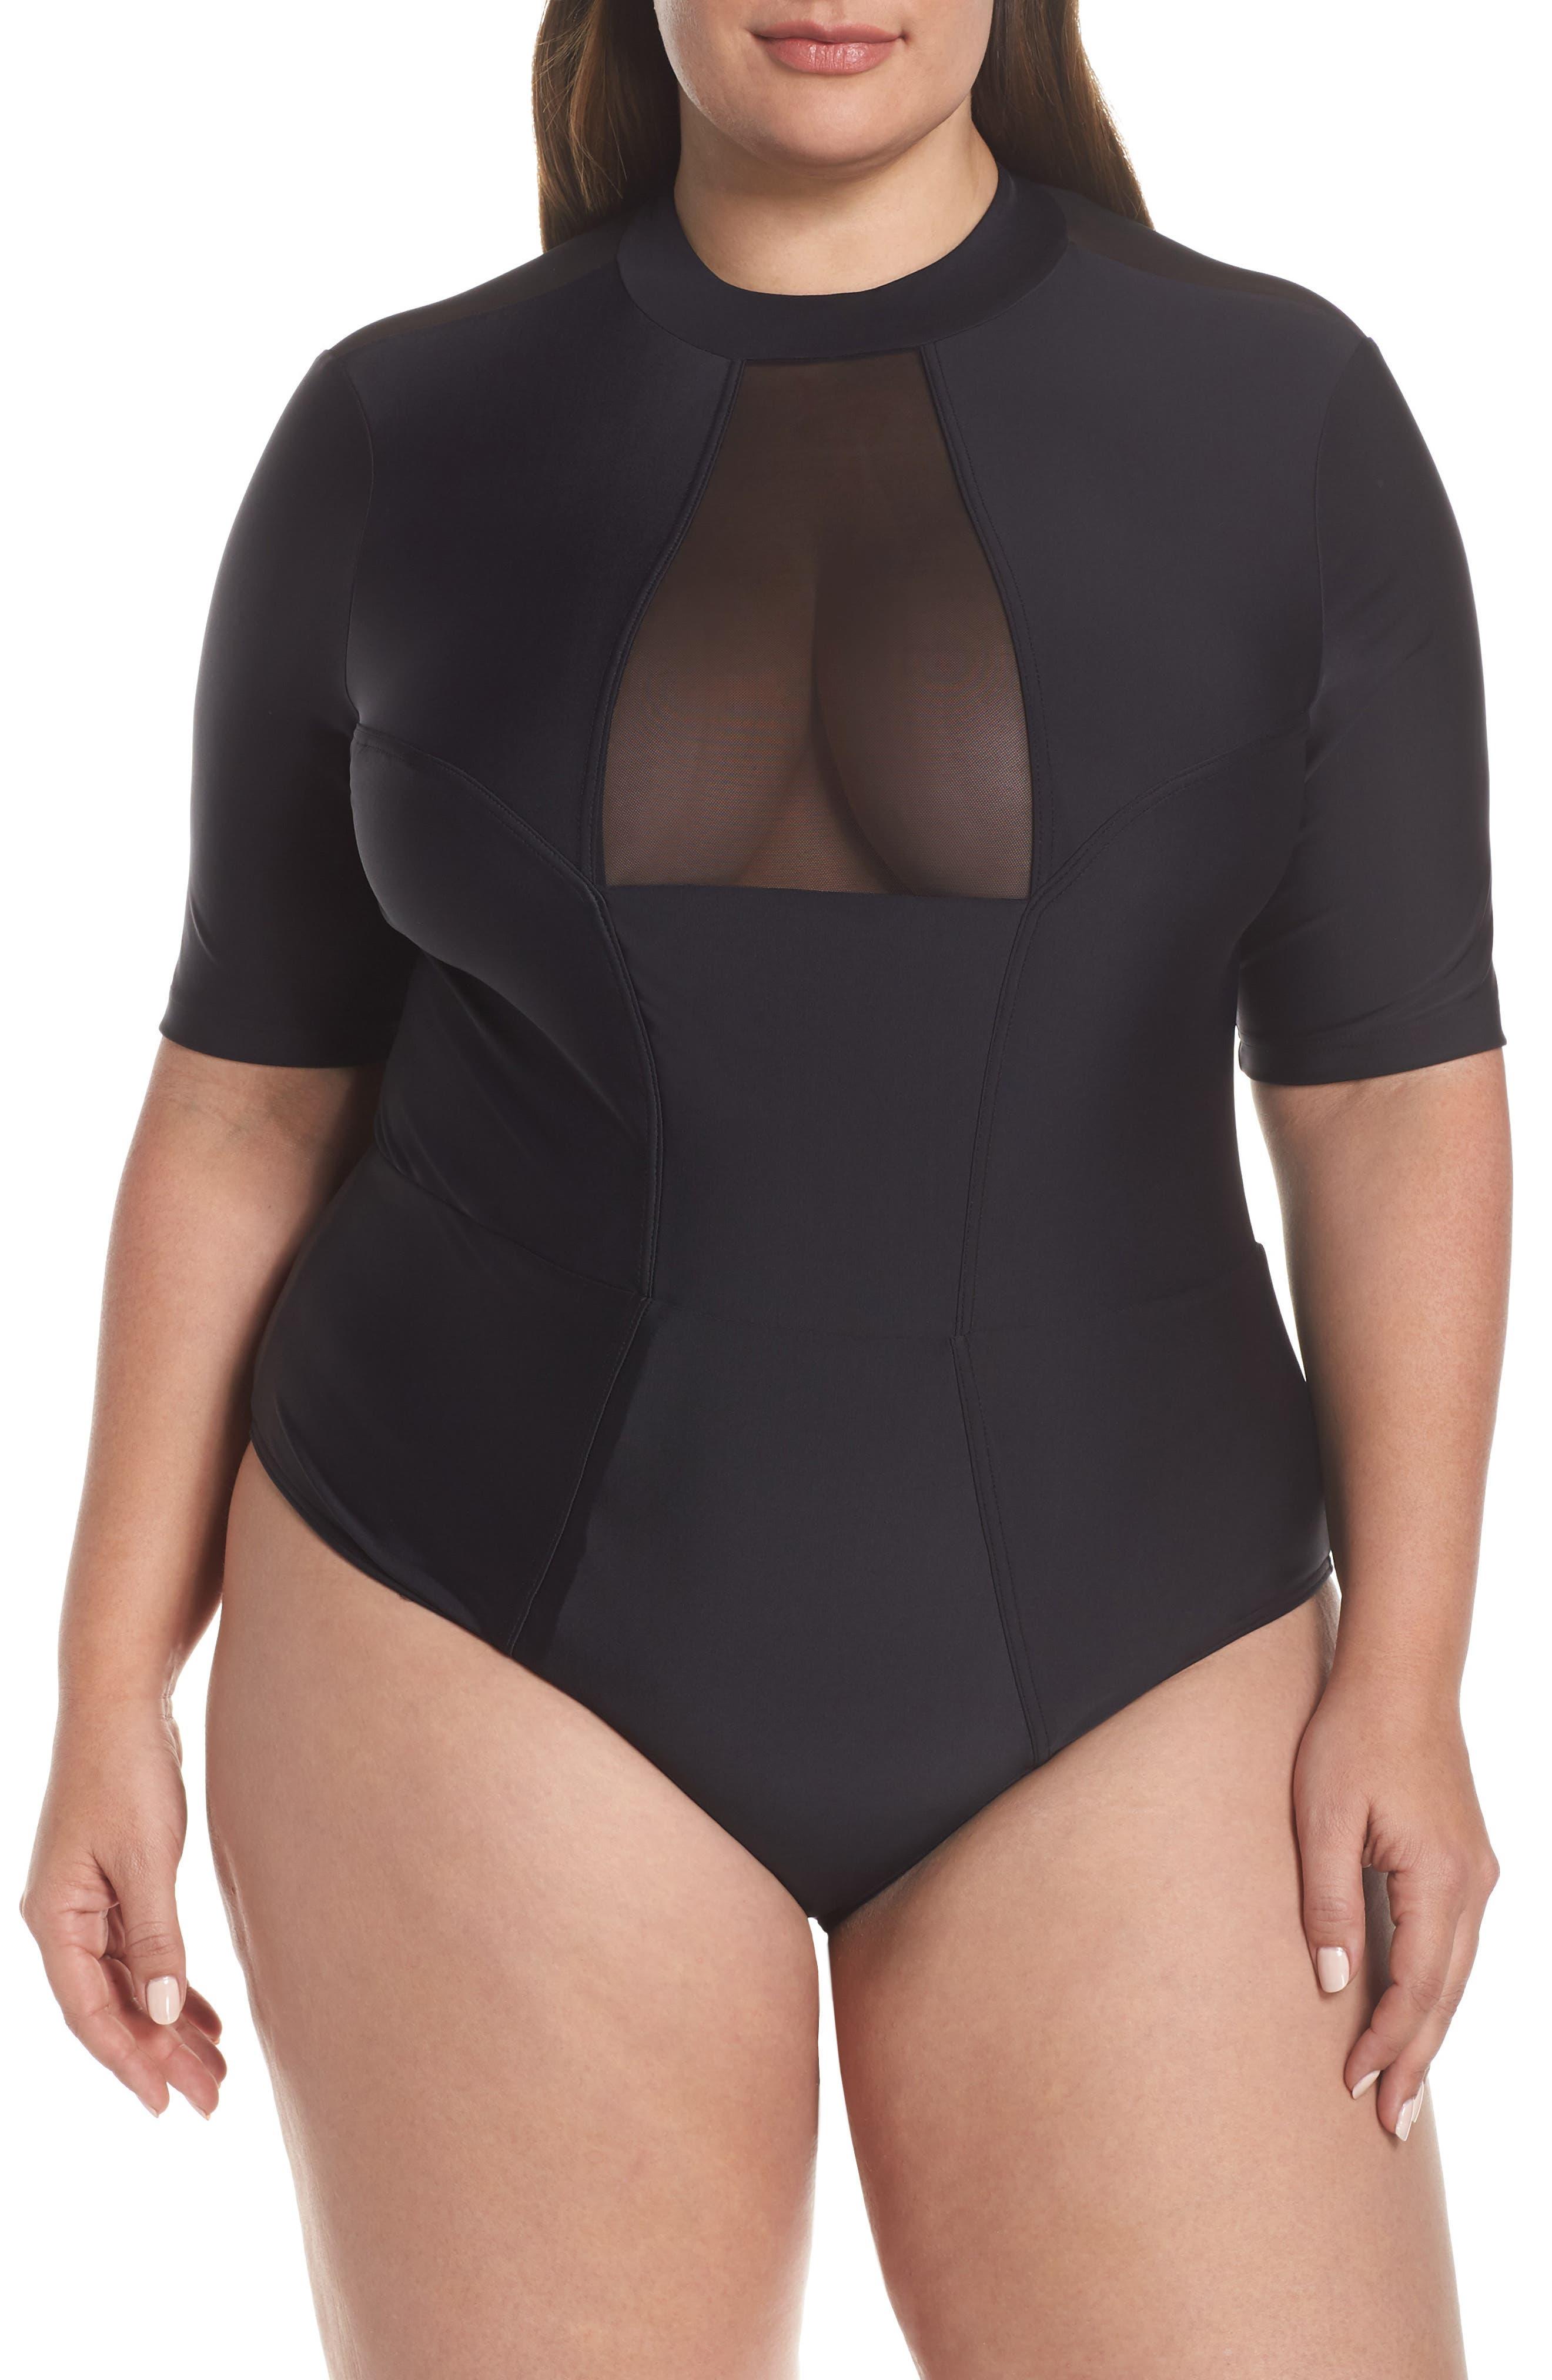 Plus Size Chromat Tidal Ii Ilusion Detail One-Piece Swimsuit, Black